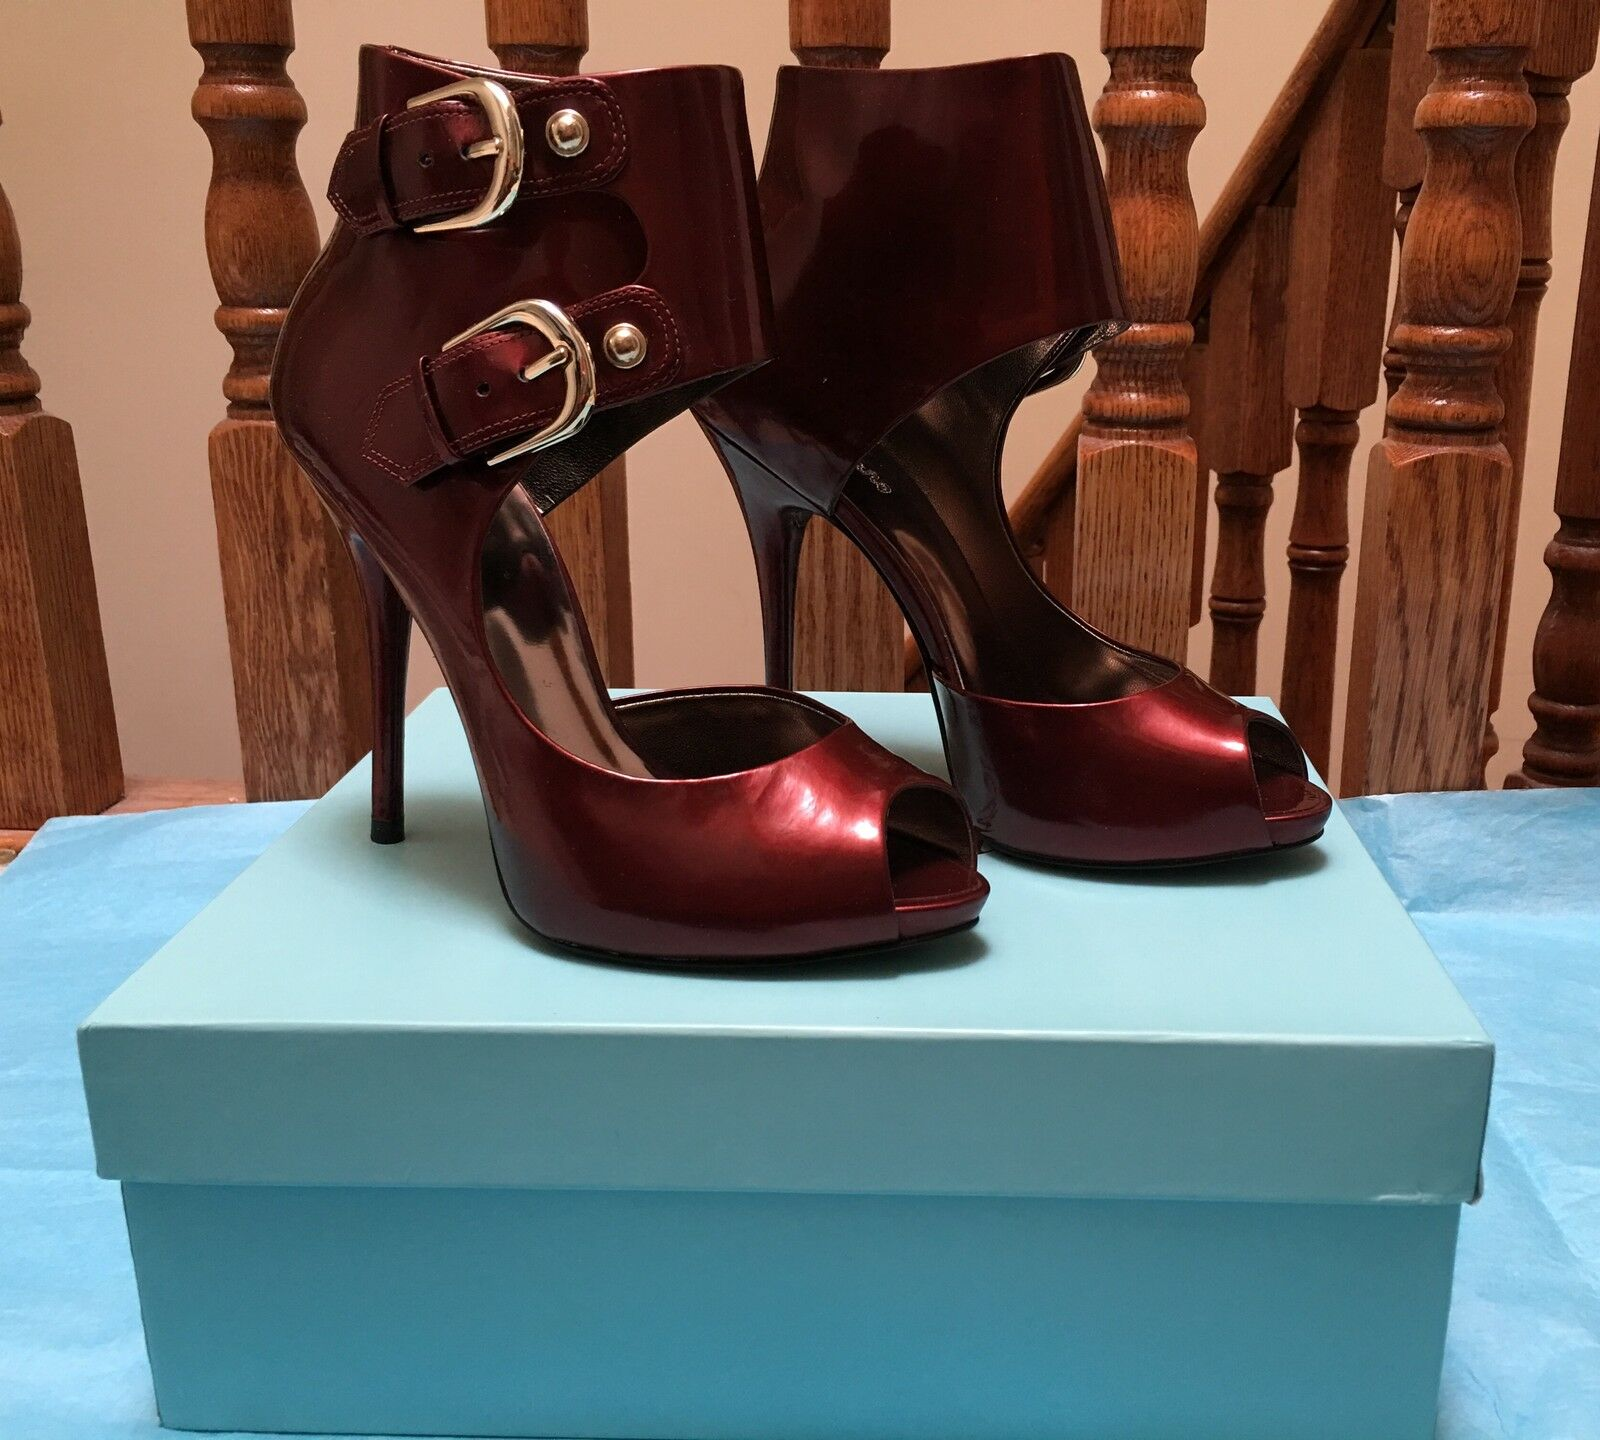 NIB 285 MARCIANO GUESS TAM DARK ROT Schuhe SIZE 10 HOT    LAST1